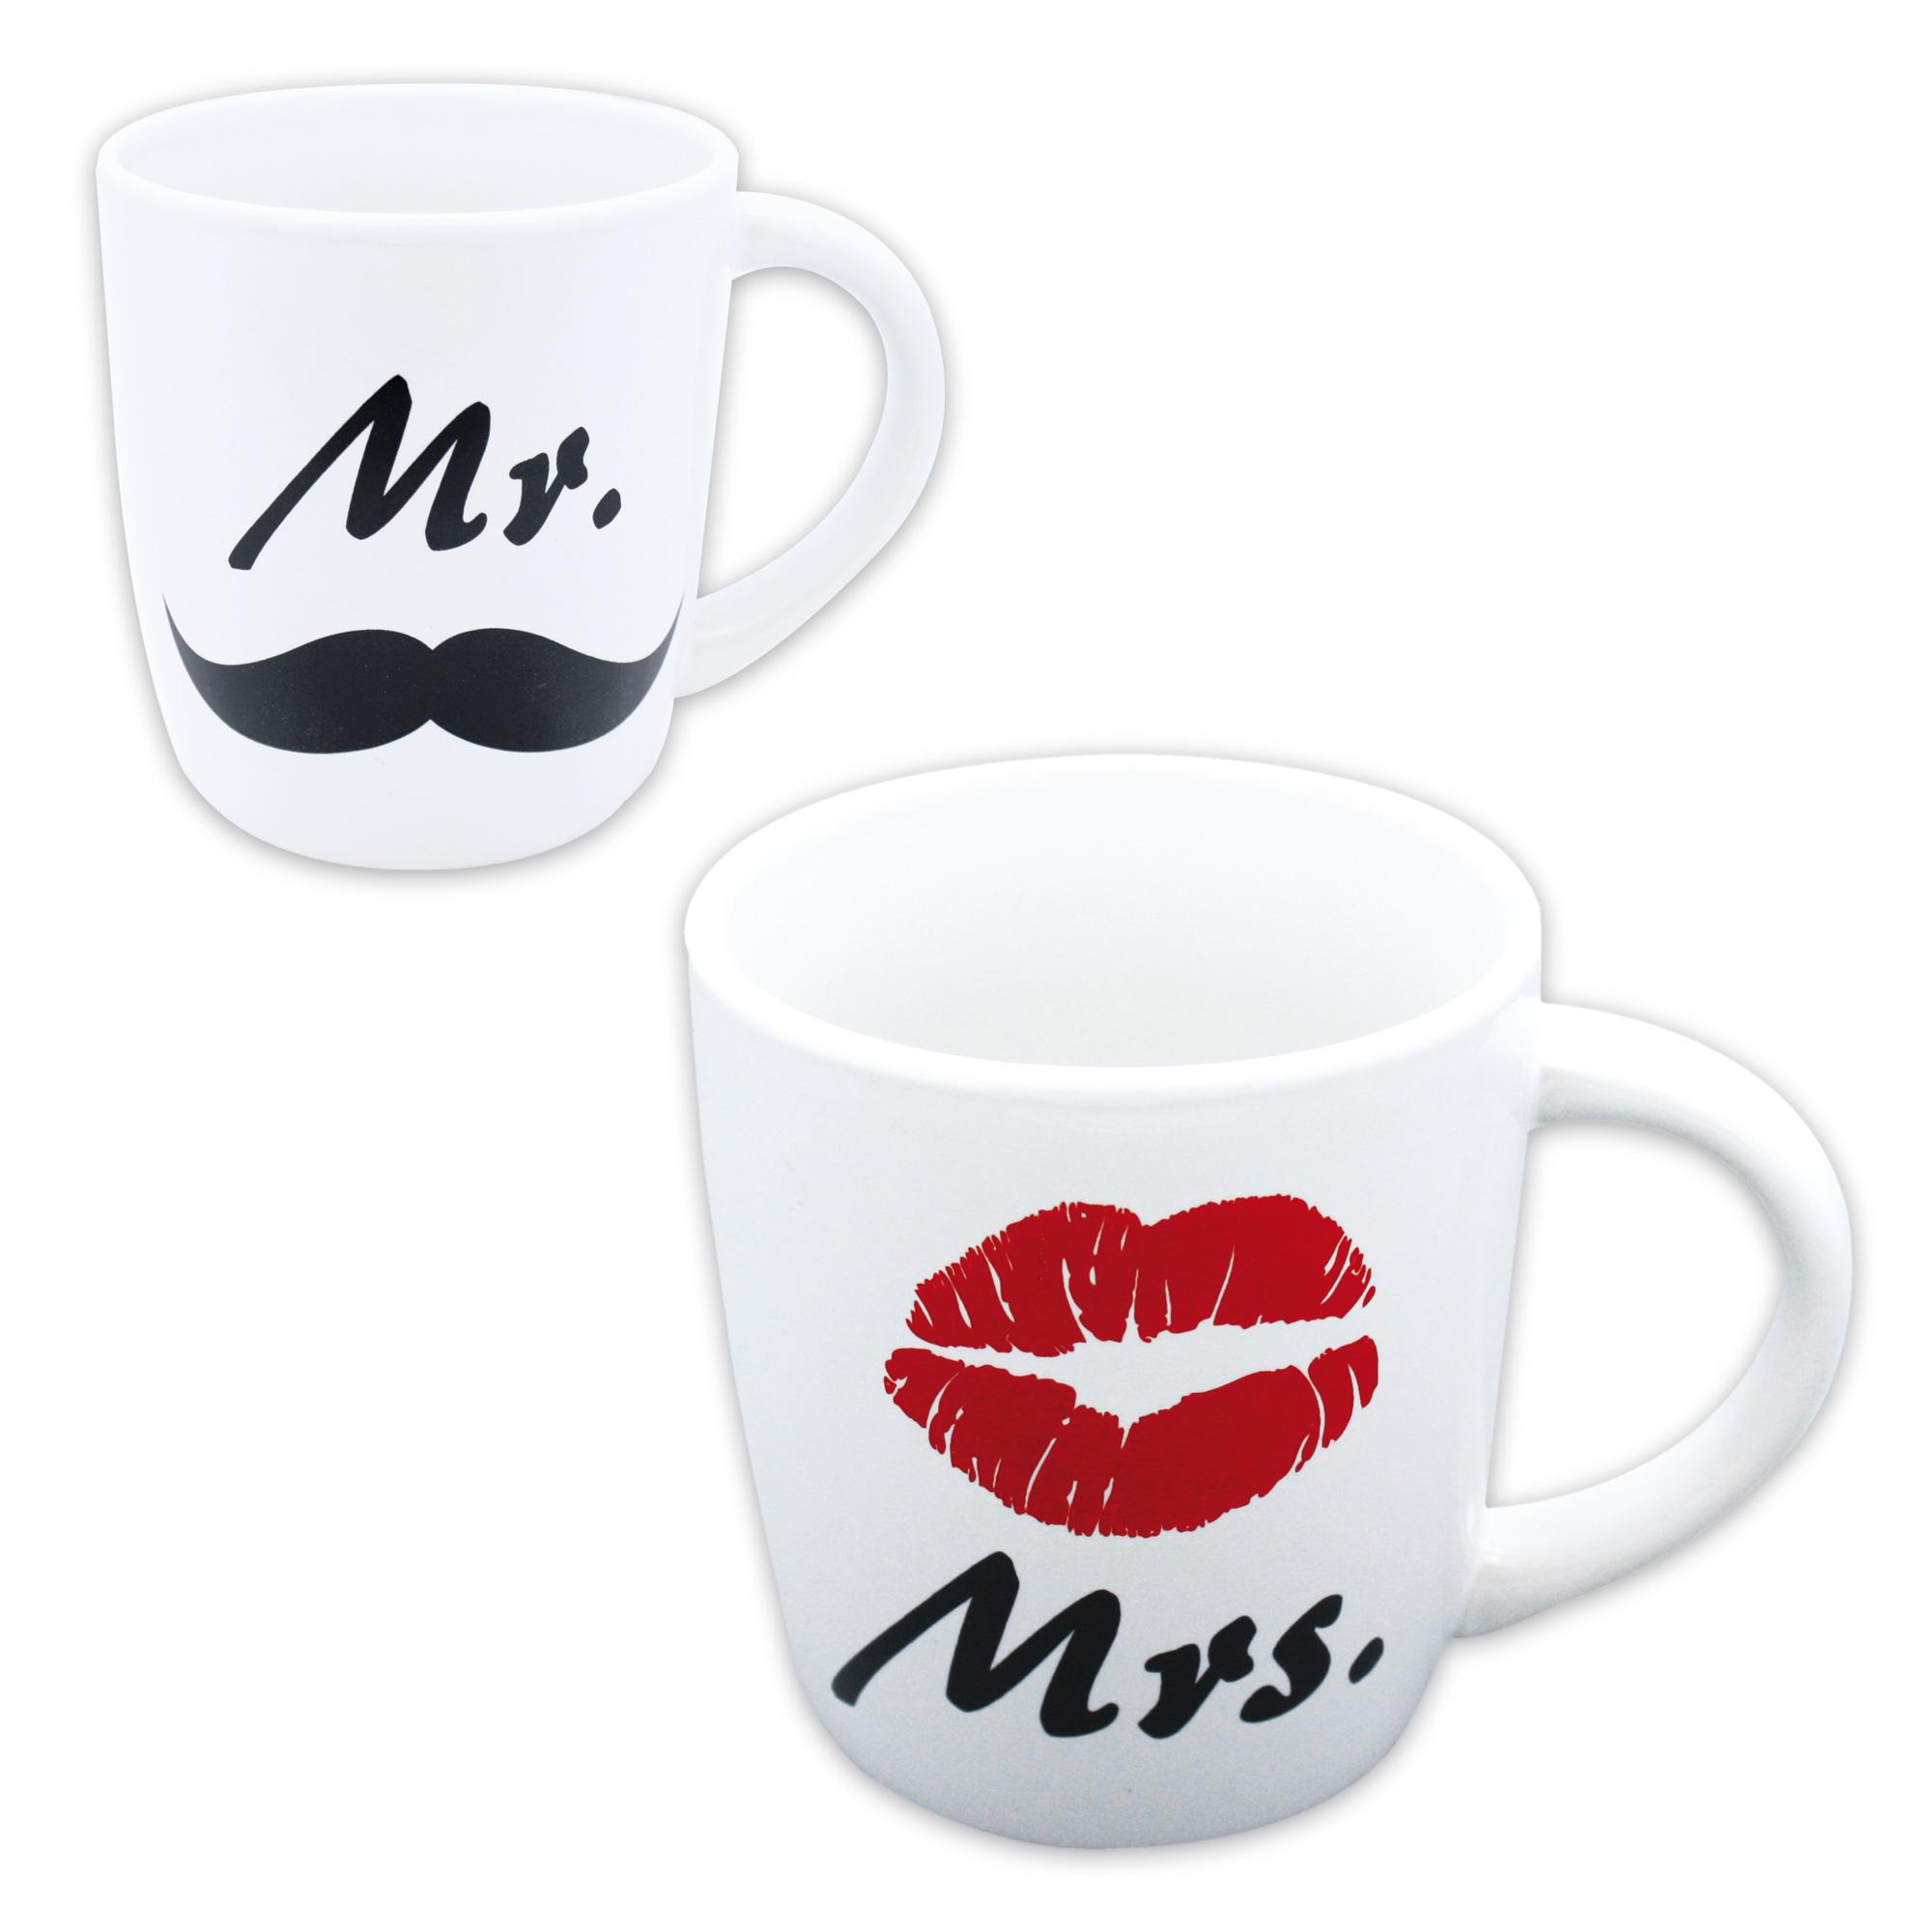 Tasse Mr Mrs : tasse mr mrs kaffeetasse teetasse sammlertasse dekotasse keramik 2er set ebay ~ Teatrodelosmanantiales.com Idées de Décoration